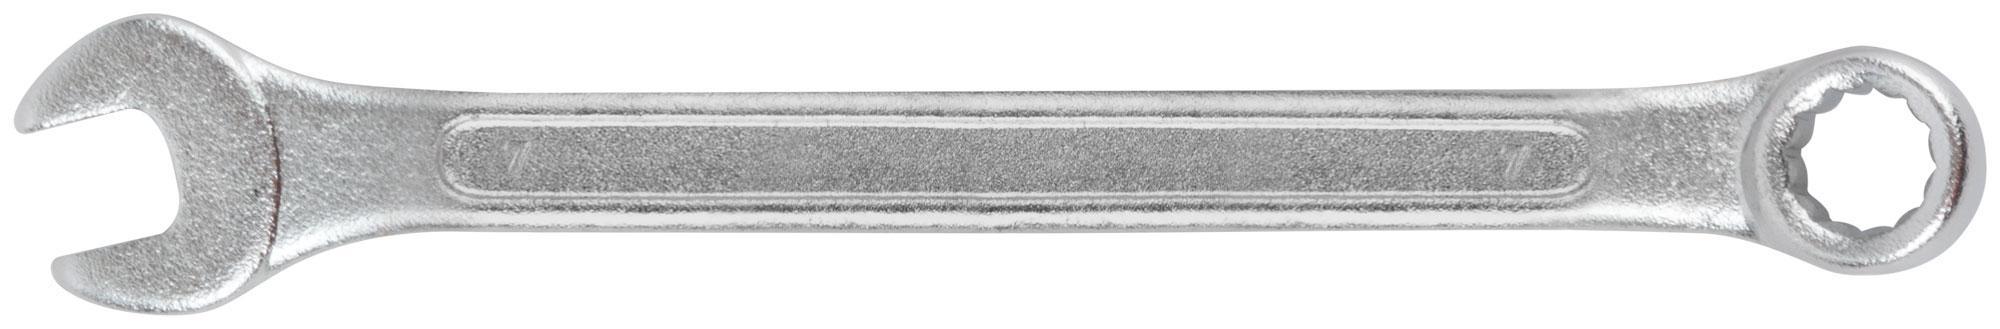 Ключ гаечный комбинированный Fit 63137 (7 мм) plus size two tones panel chiffon blouse